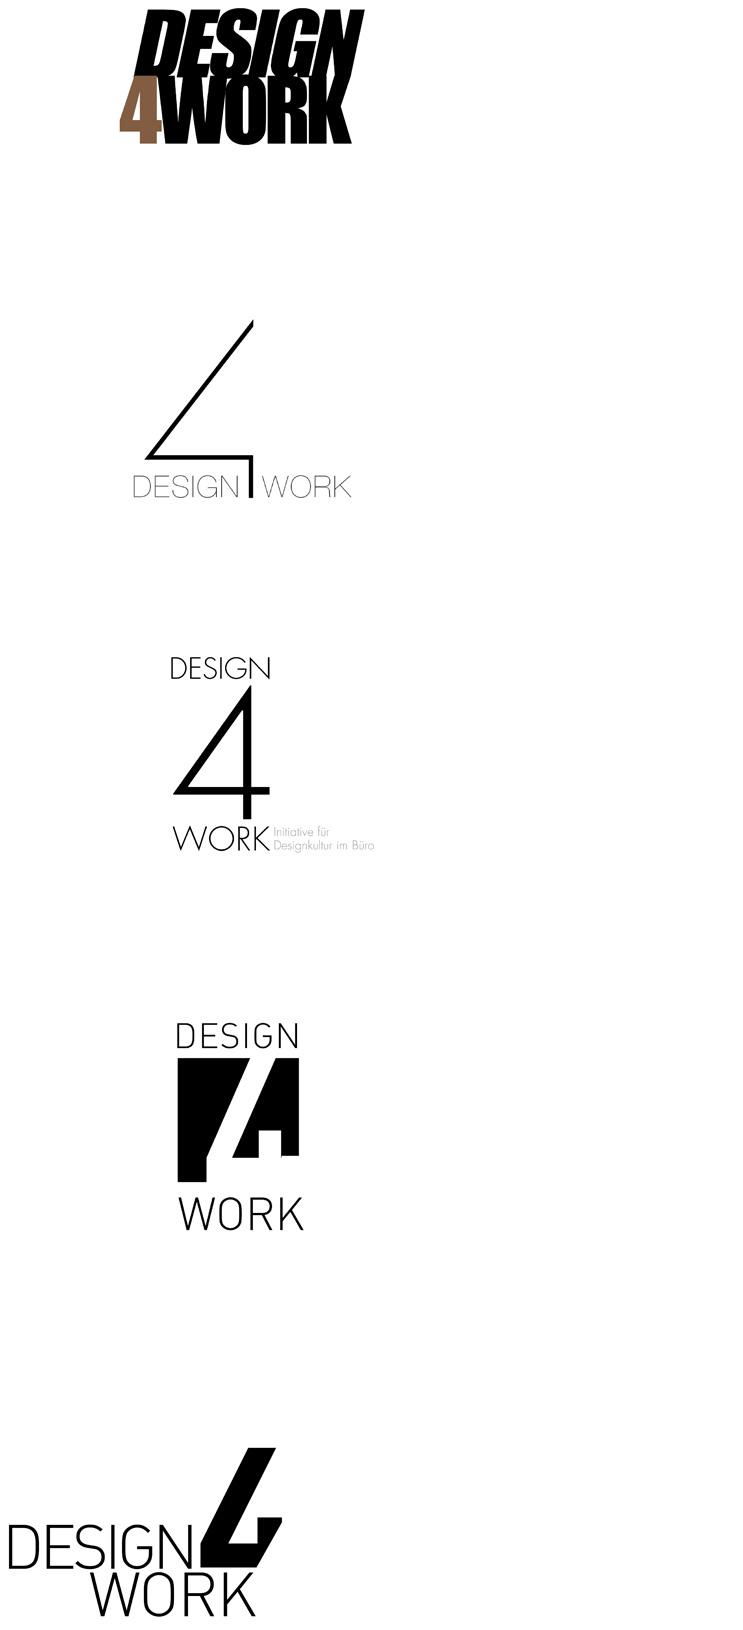 Triptrap Design Münster Düsseldorf - Design 4 Work